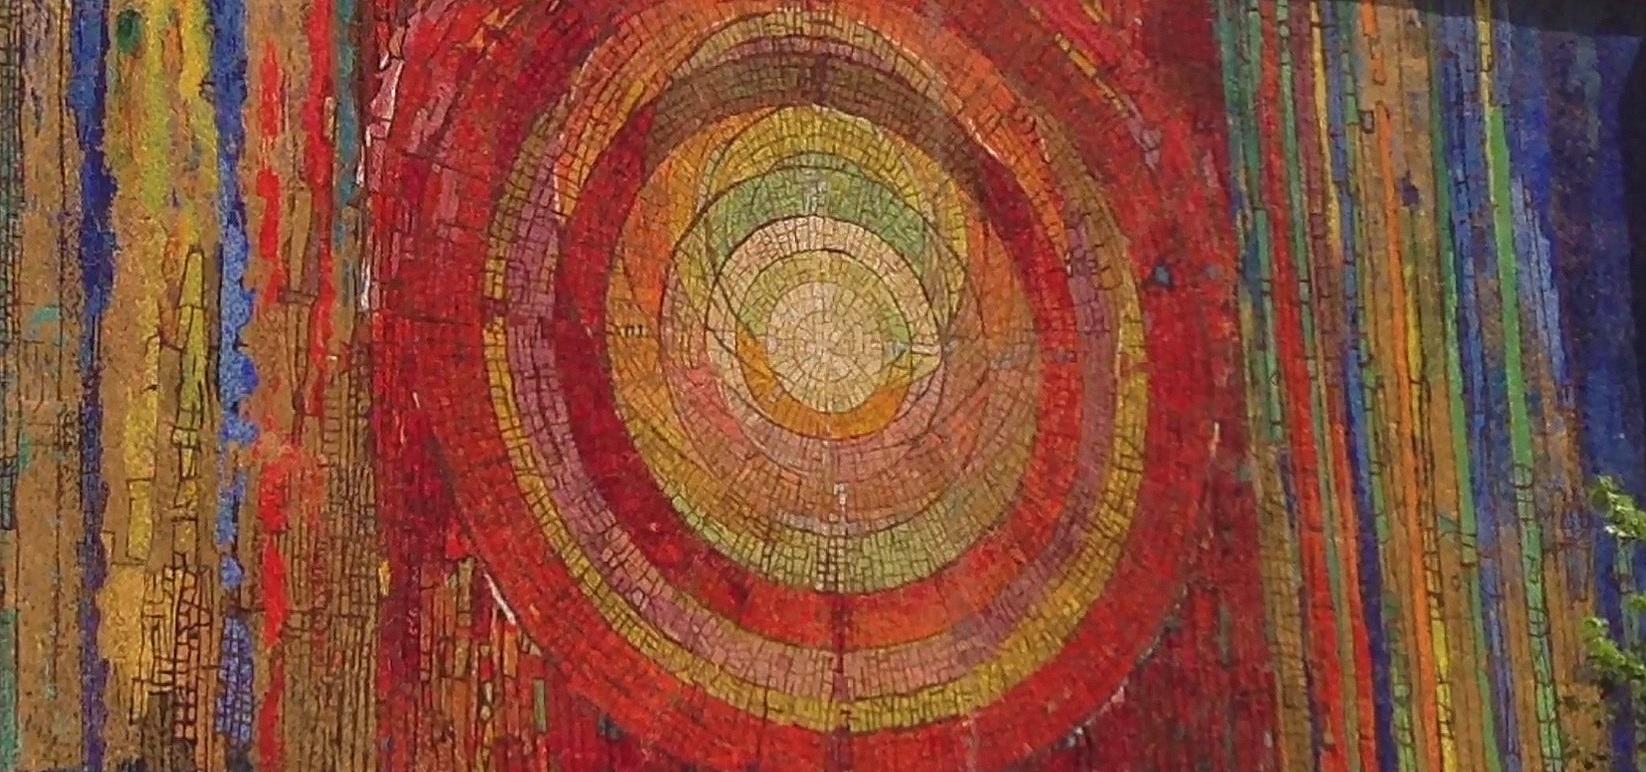 gyorgy-kepes_mosaic_st-jude-chapel_website_video_closeup